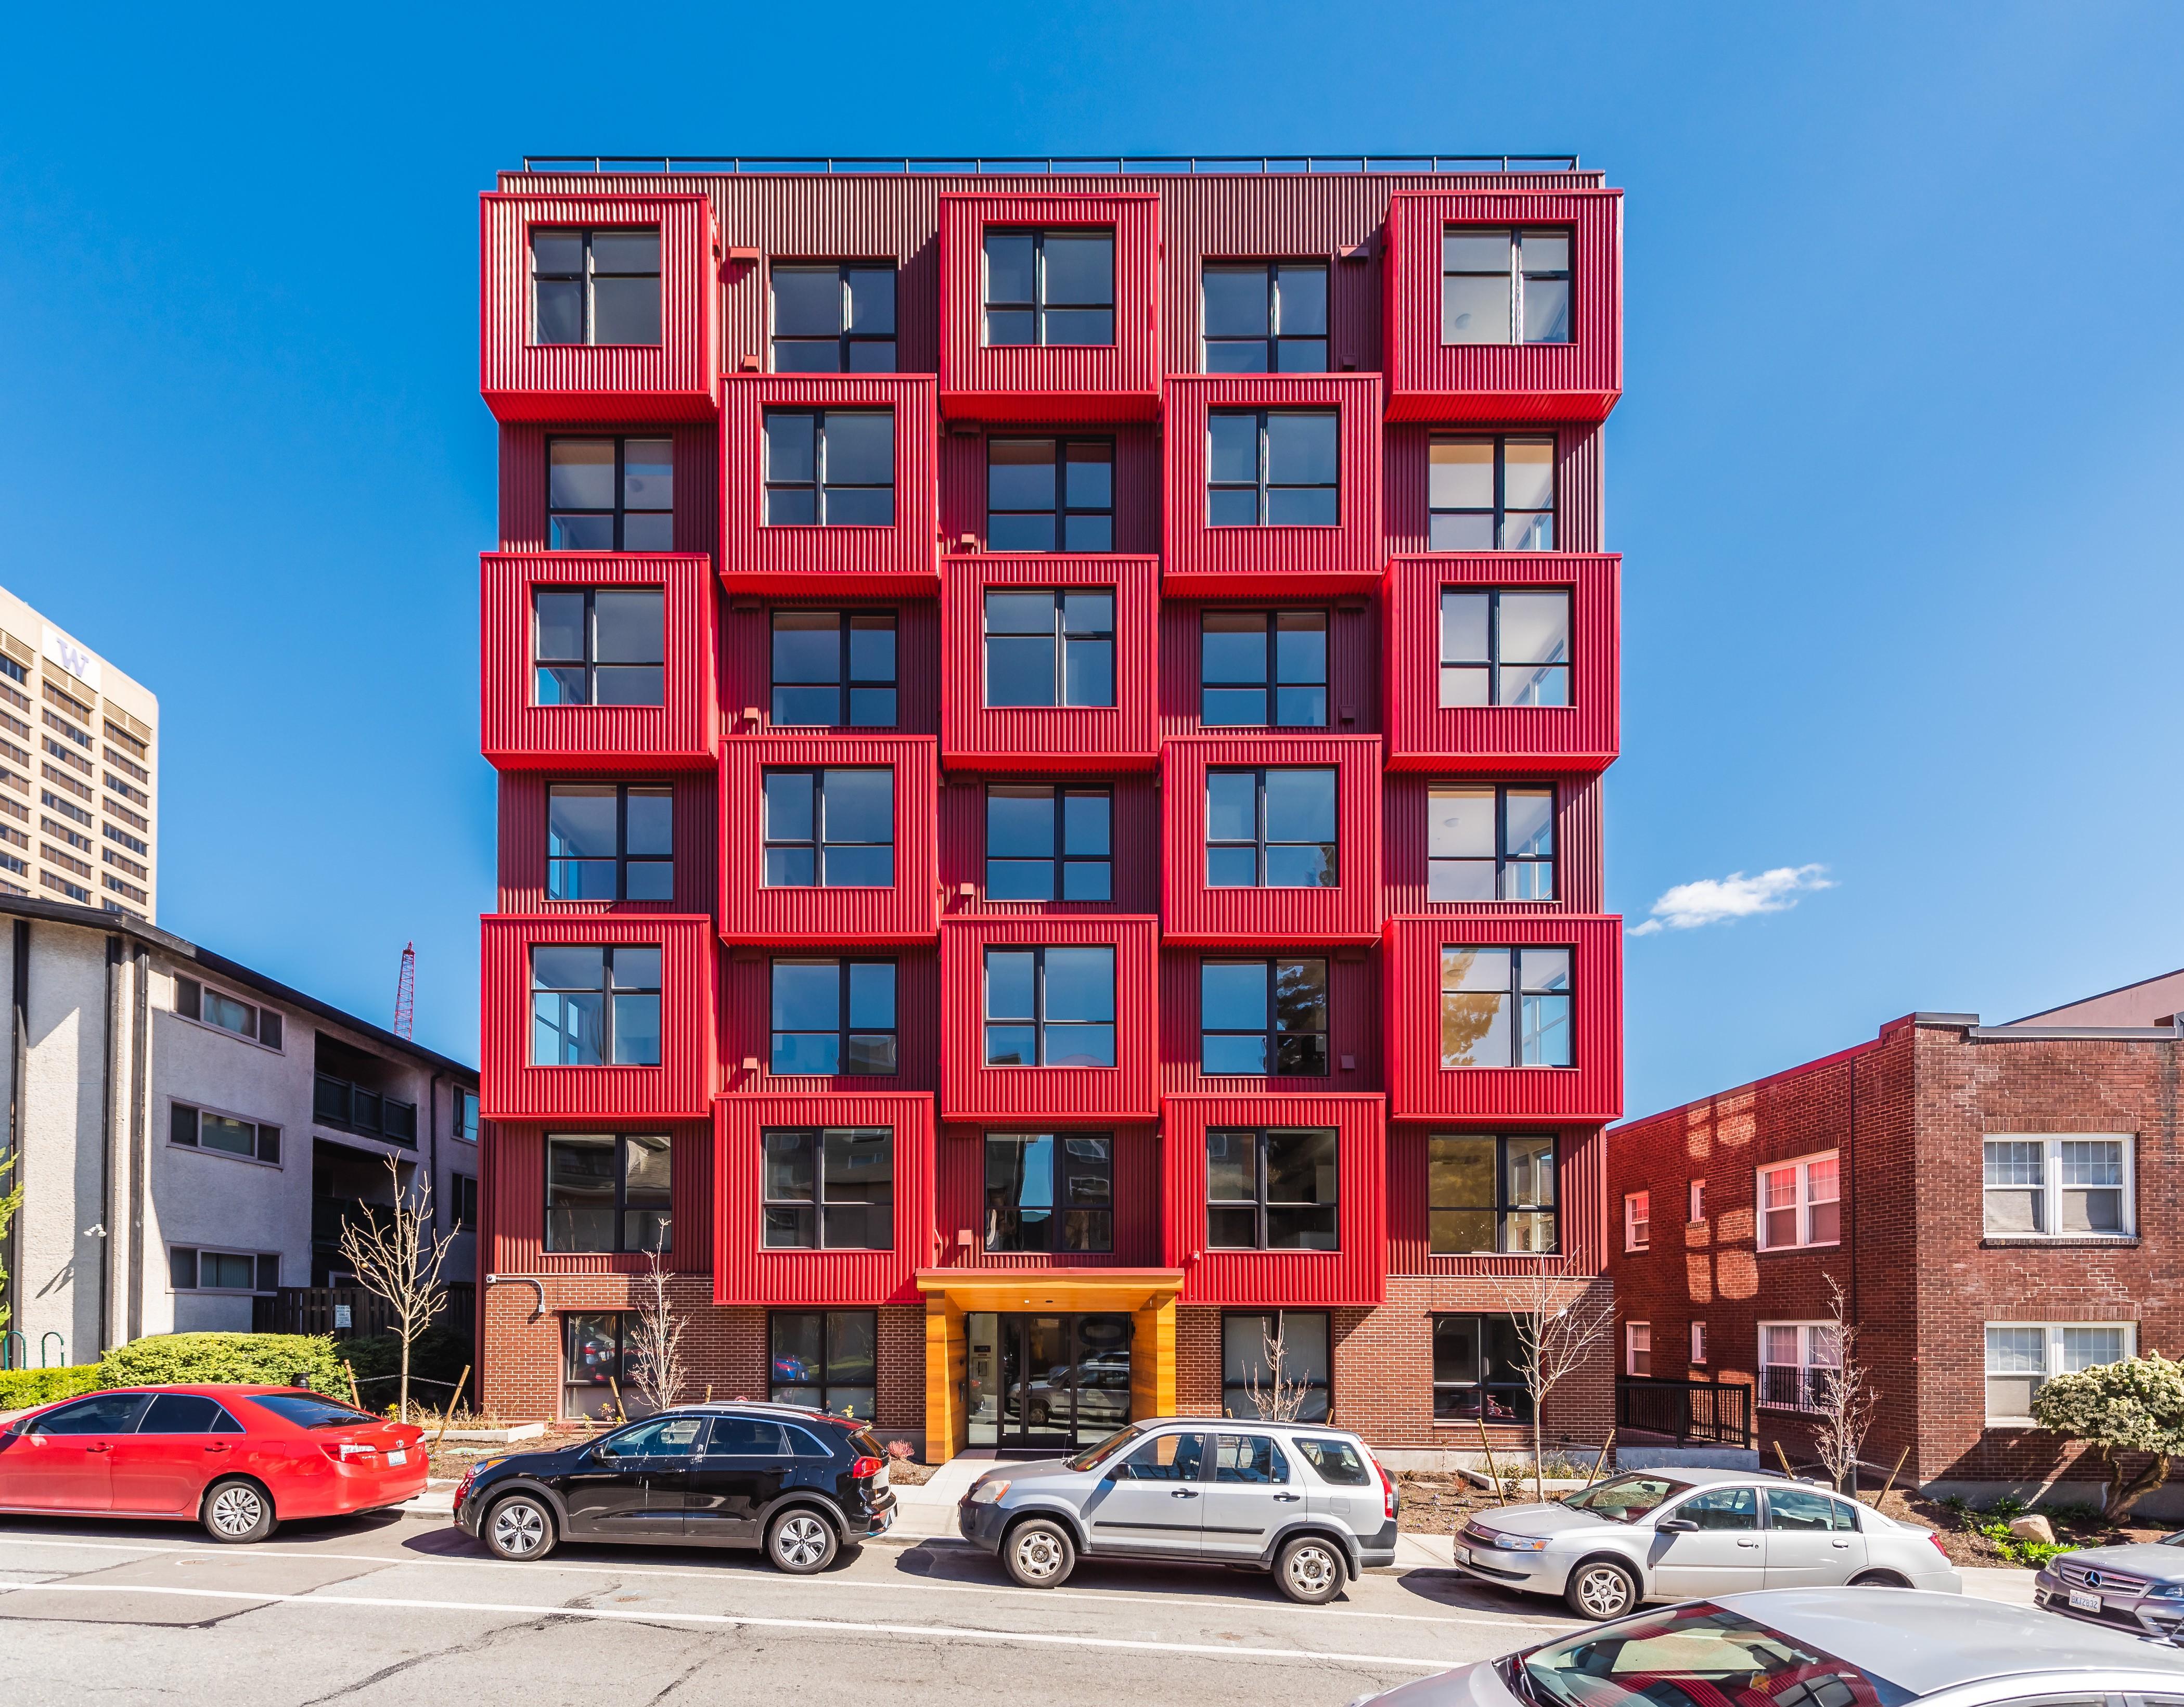 Apartments Near UW DXU Apartments for University of Washington Students in Seattle, WA